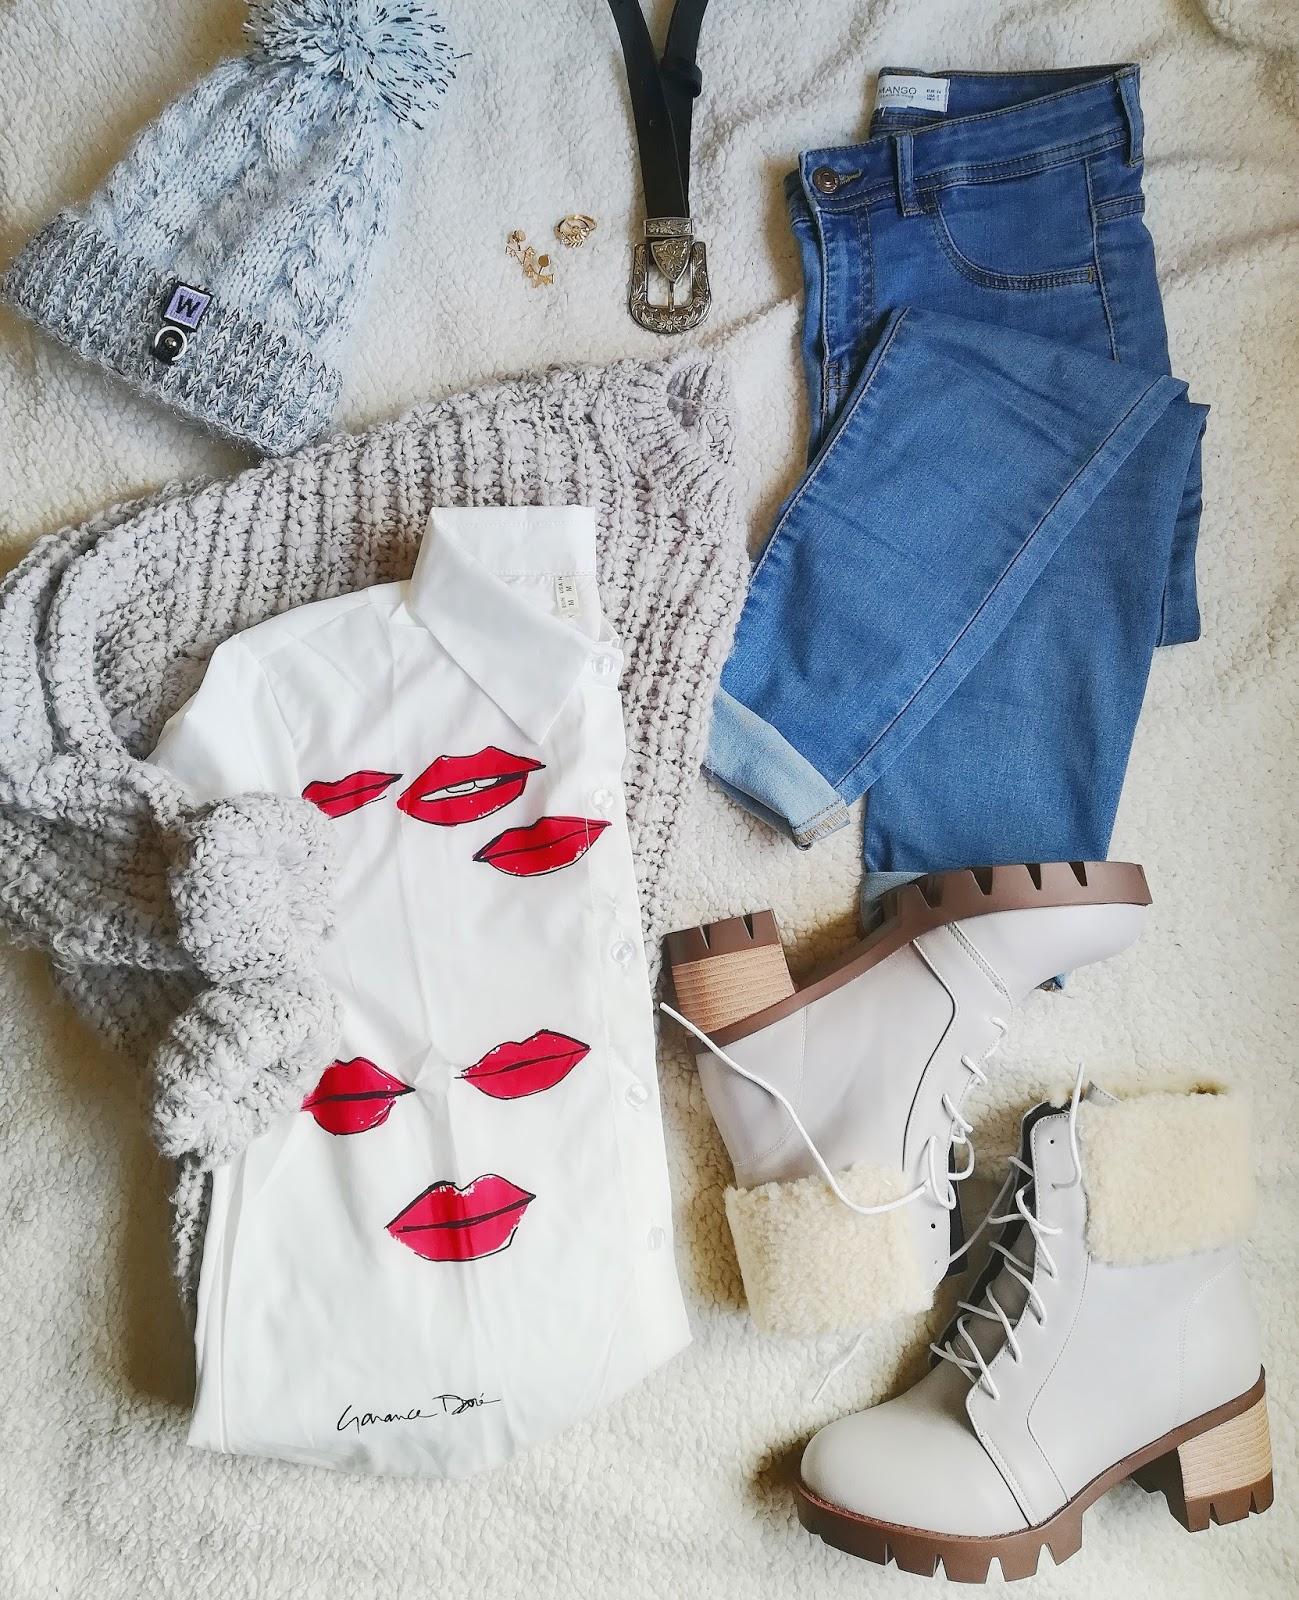 winter outfit o blog da mo